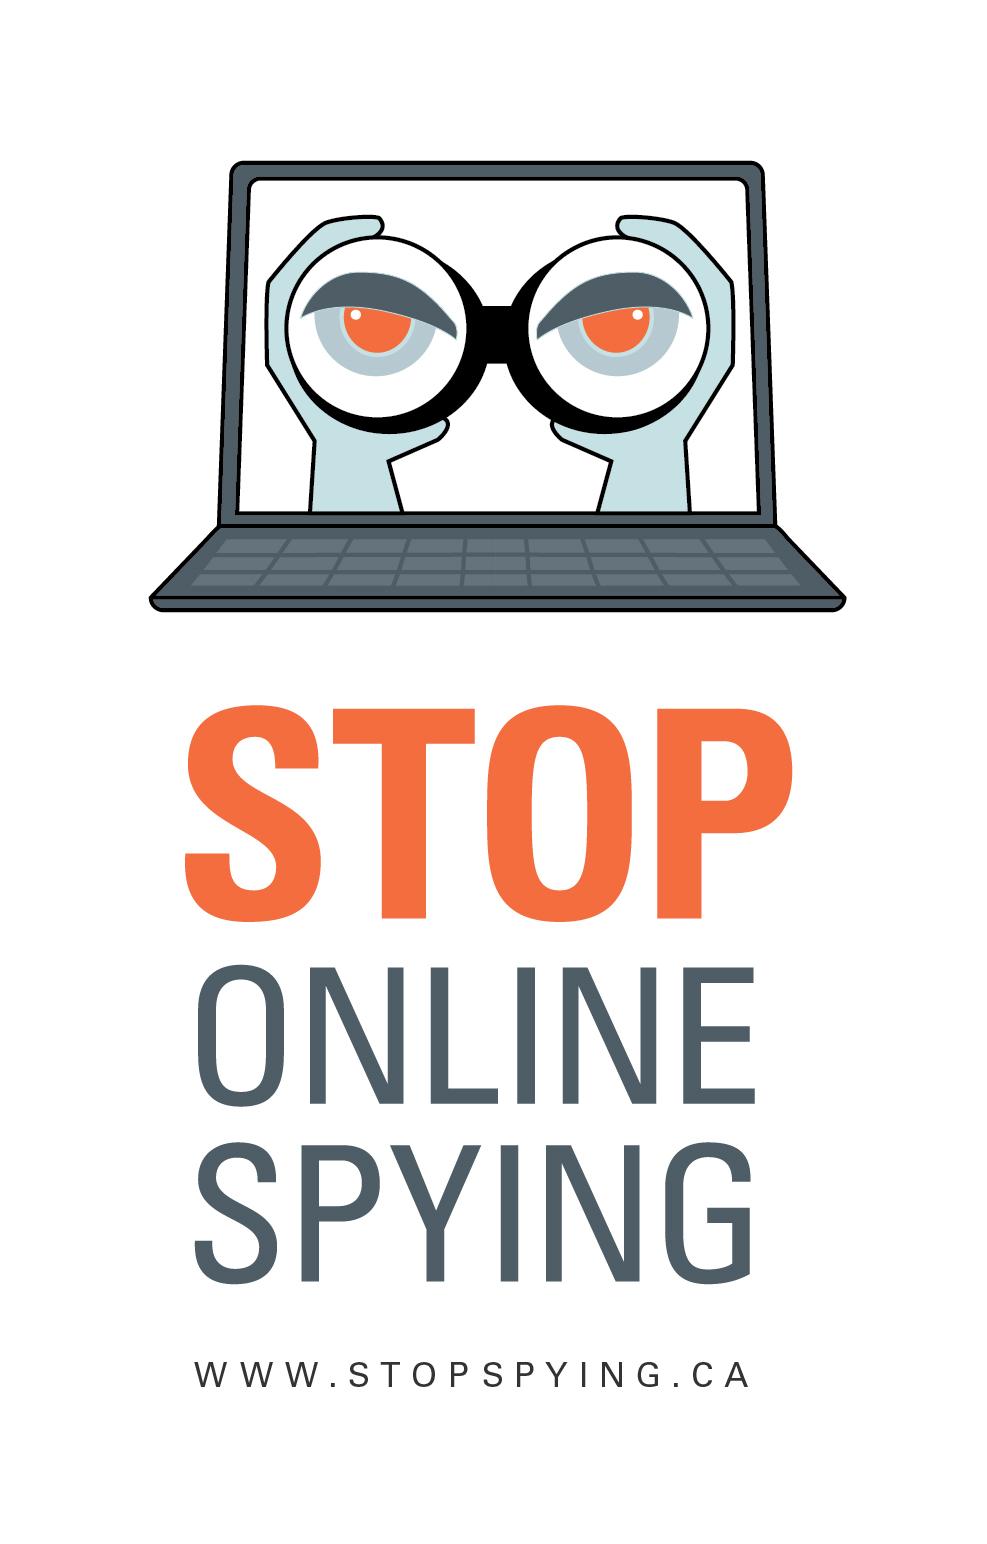 Stop Online Spying!